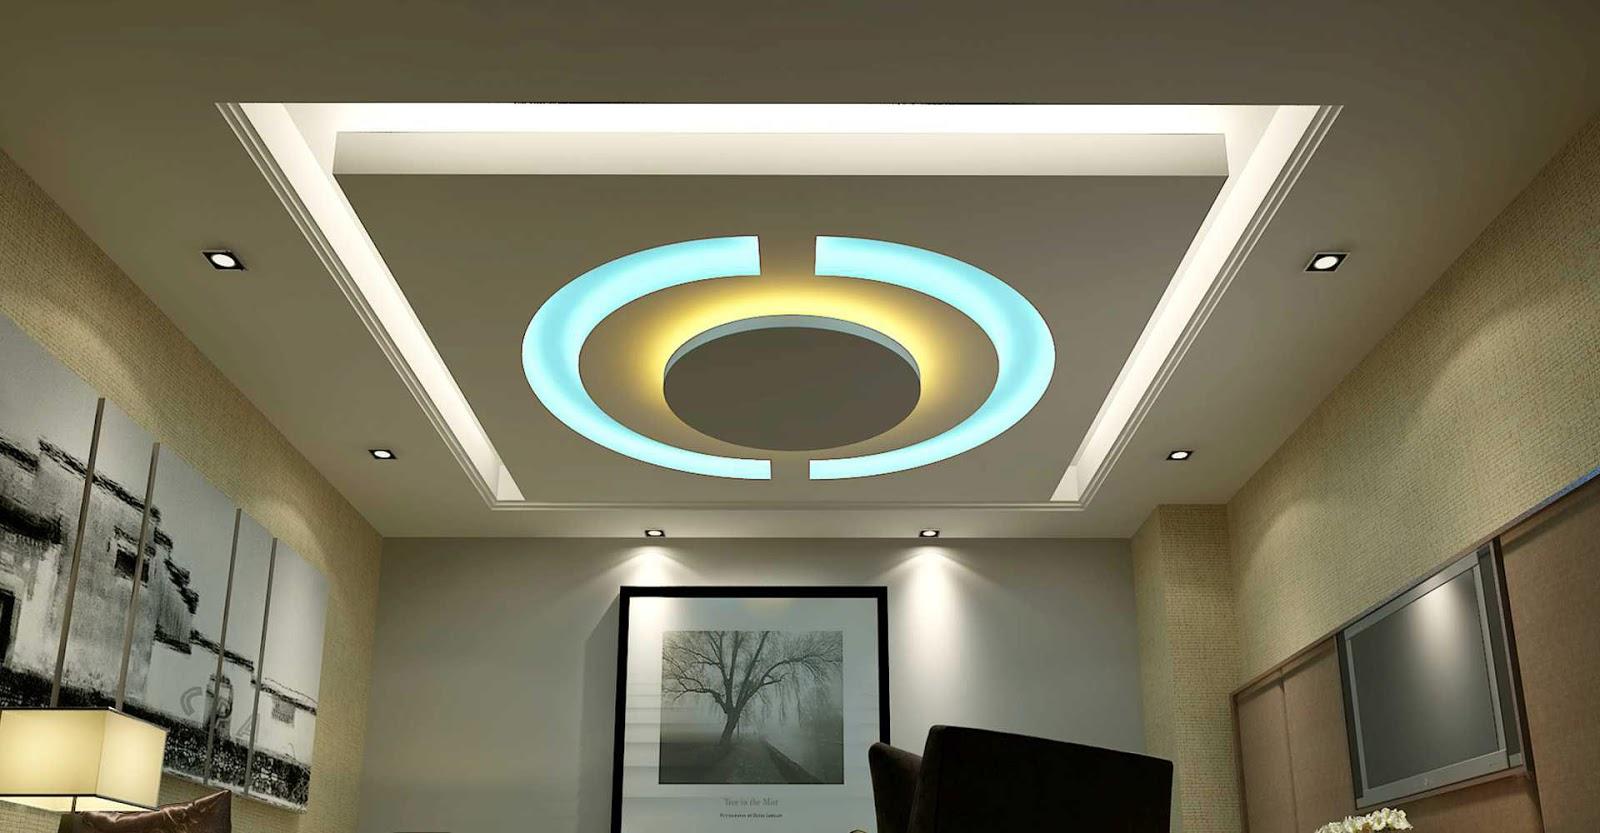 Latest gypsum ceiling designs and ideas 2020